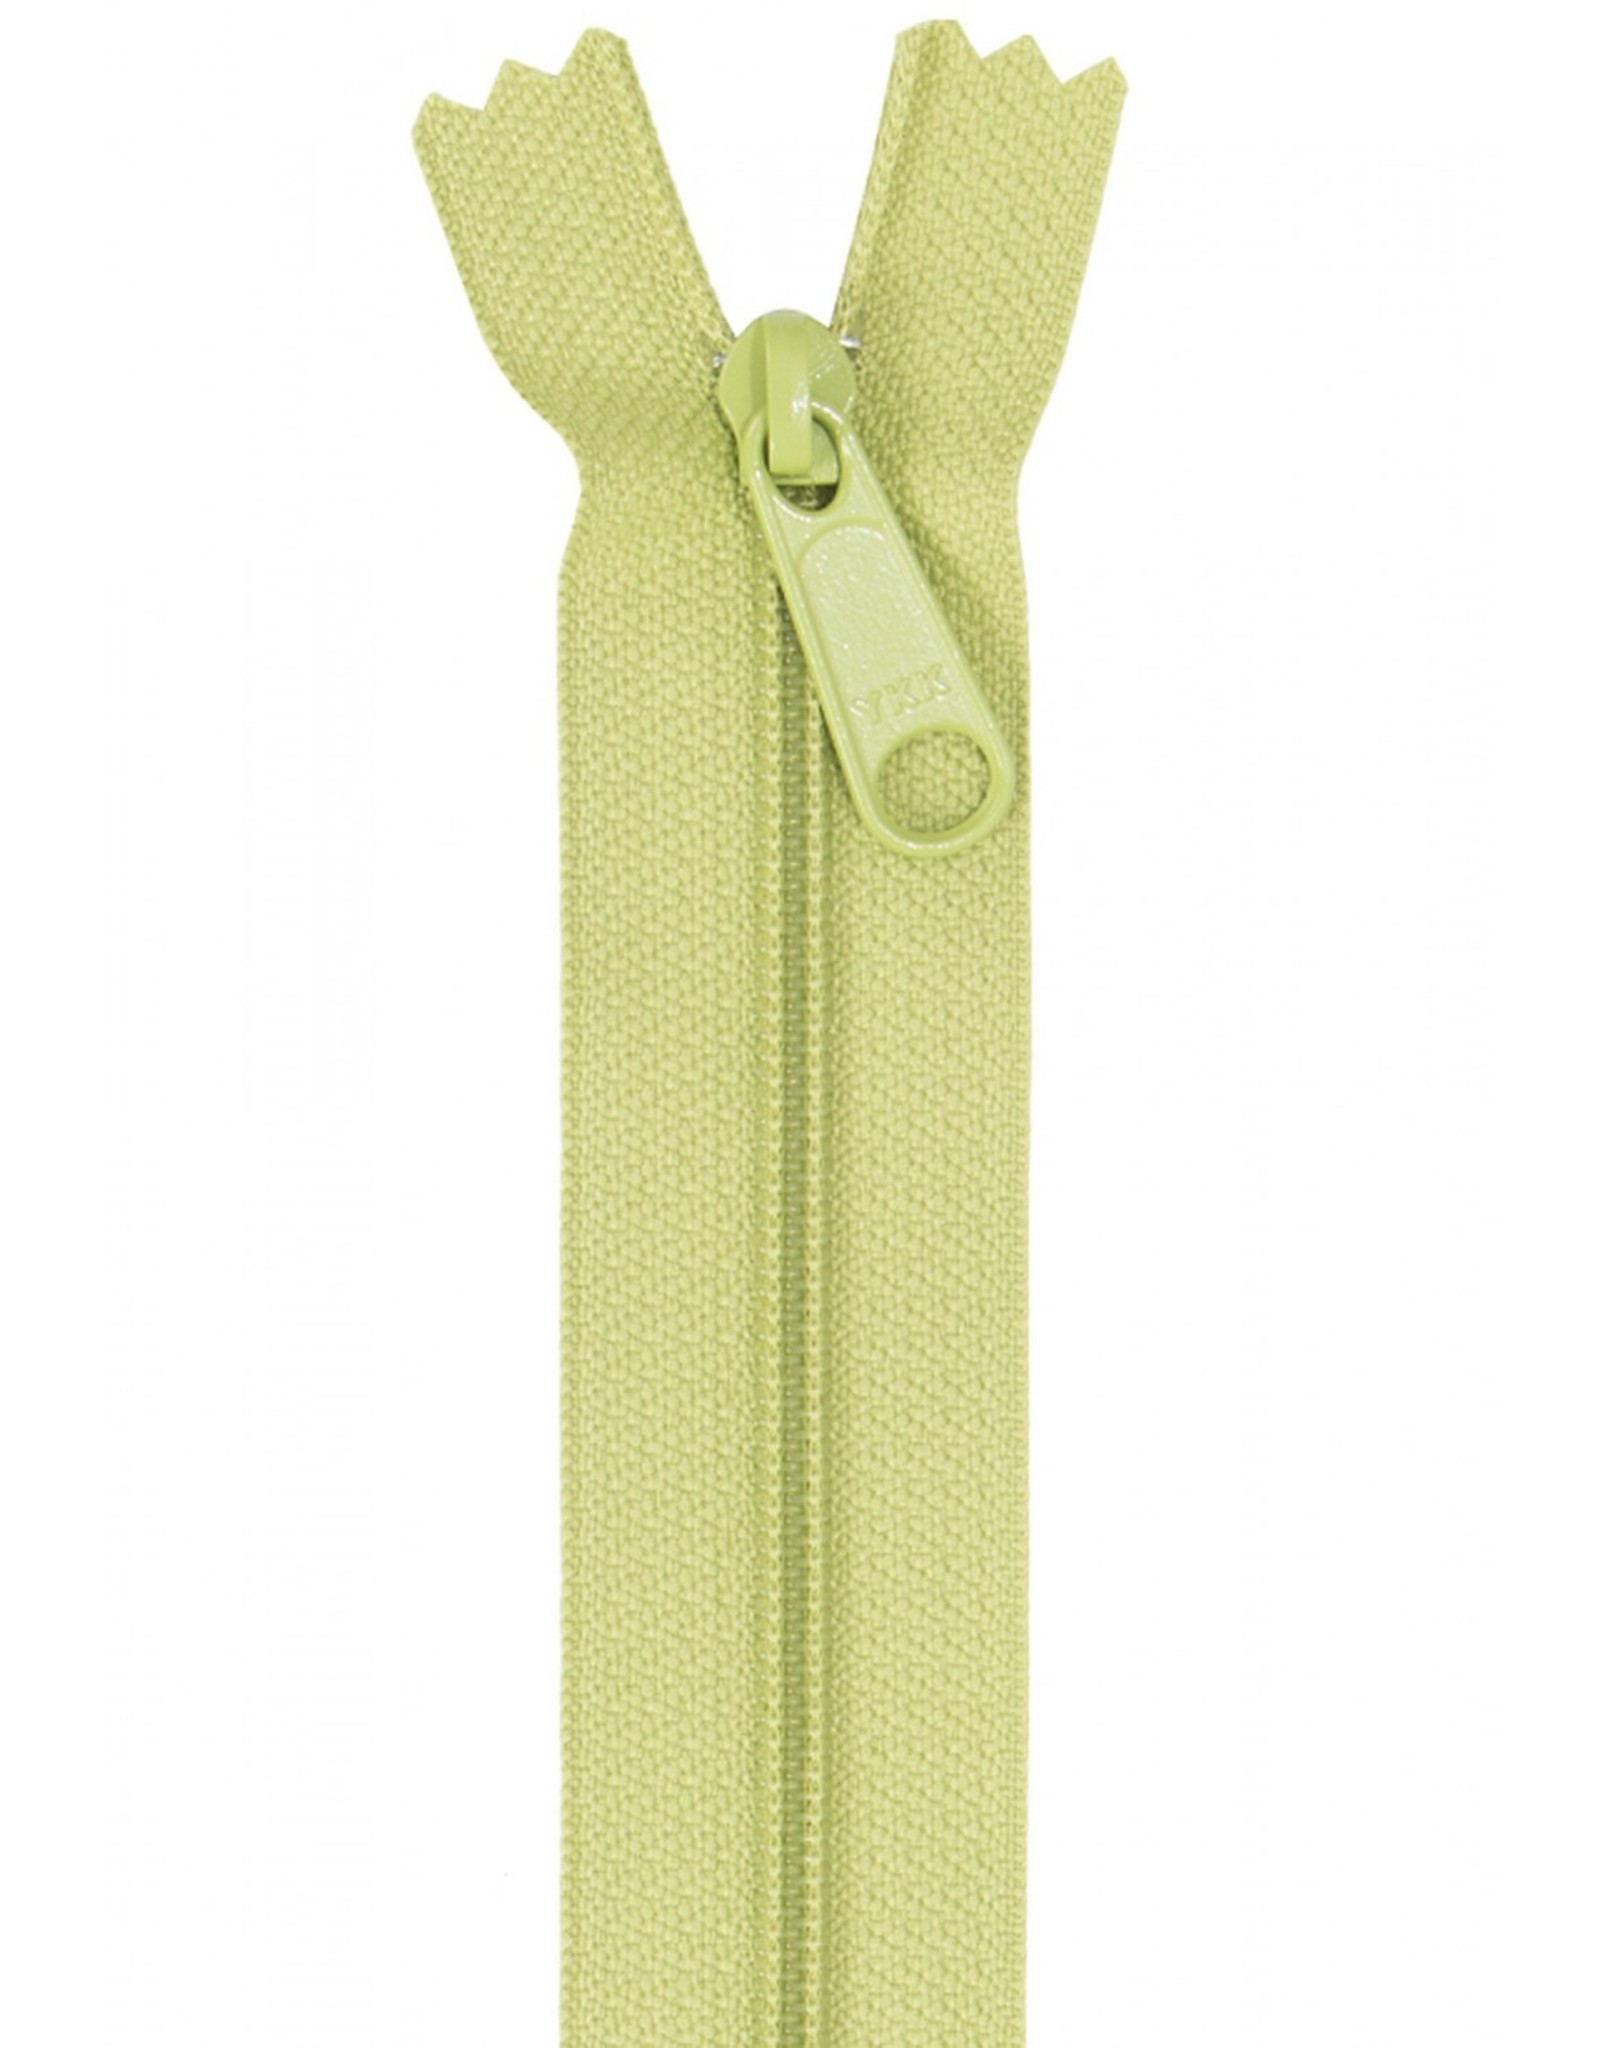 By Annie Handbag Zipper - 24 inch / 60 cm - Apple Green